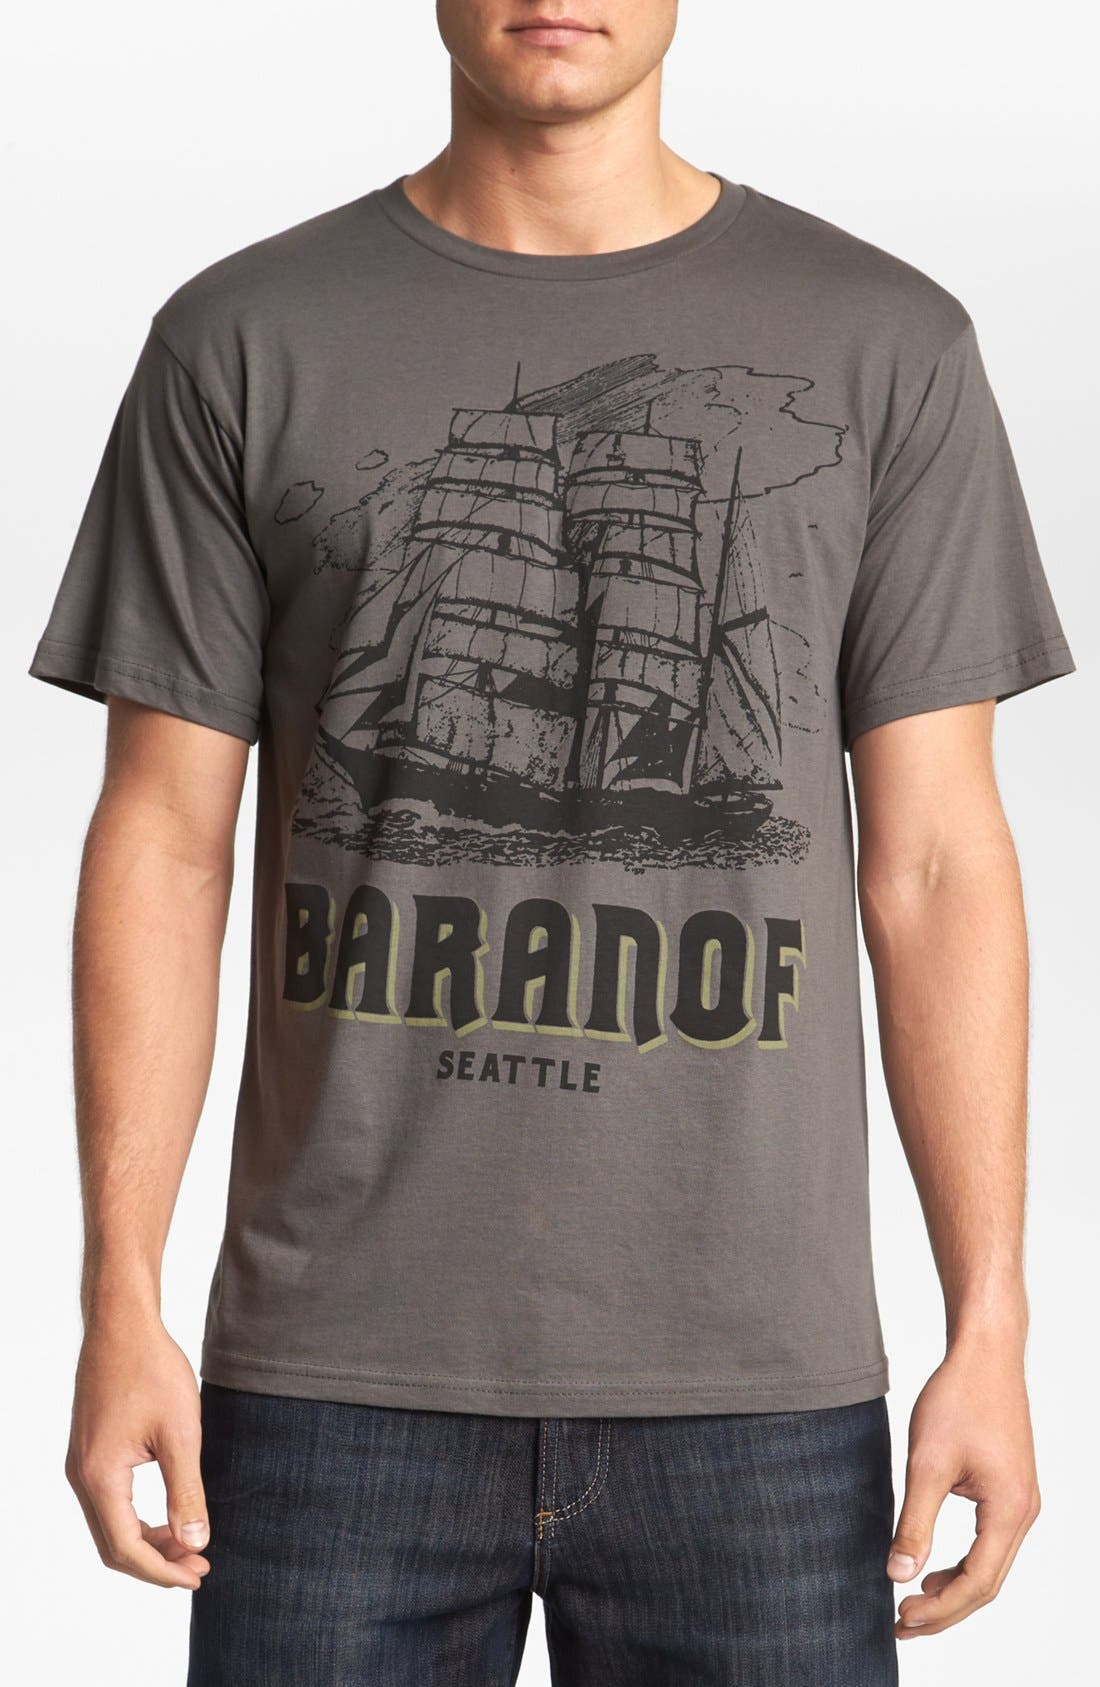 HORSES CUT SHOP 'Baranof' T-Shirt, Main, color, 020